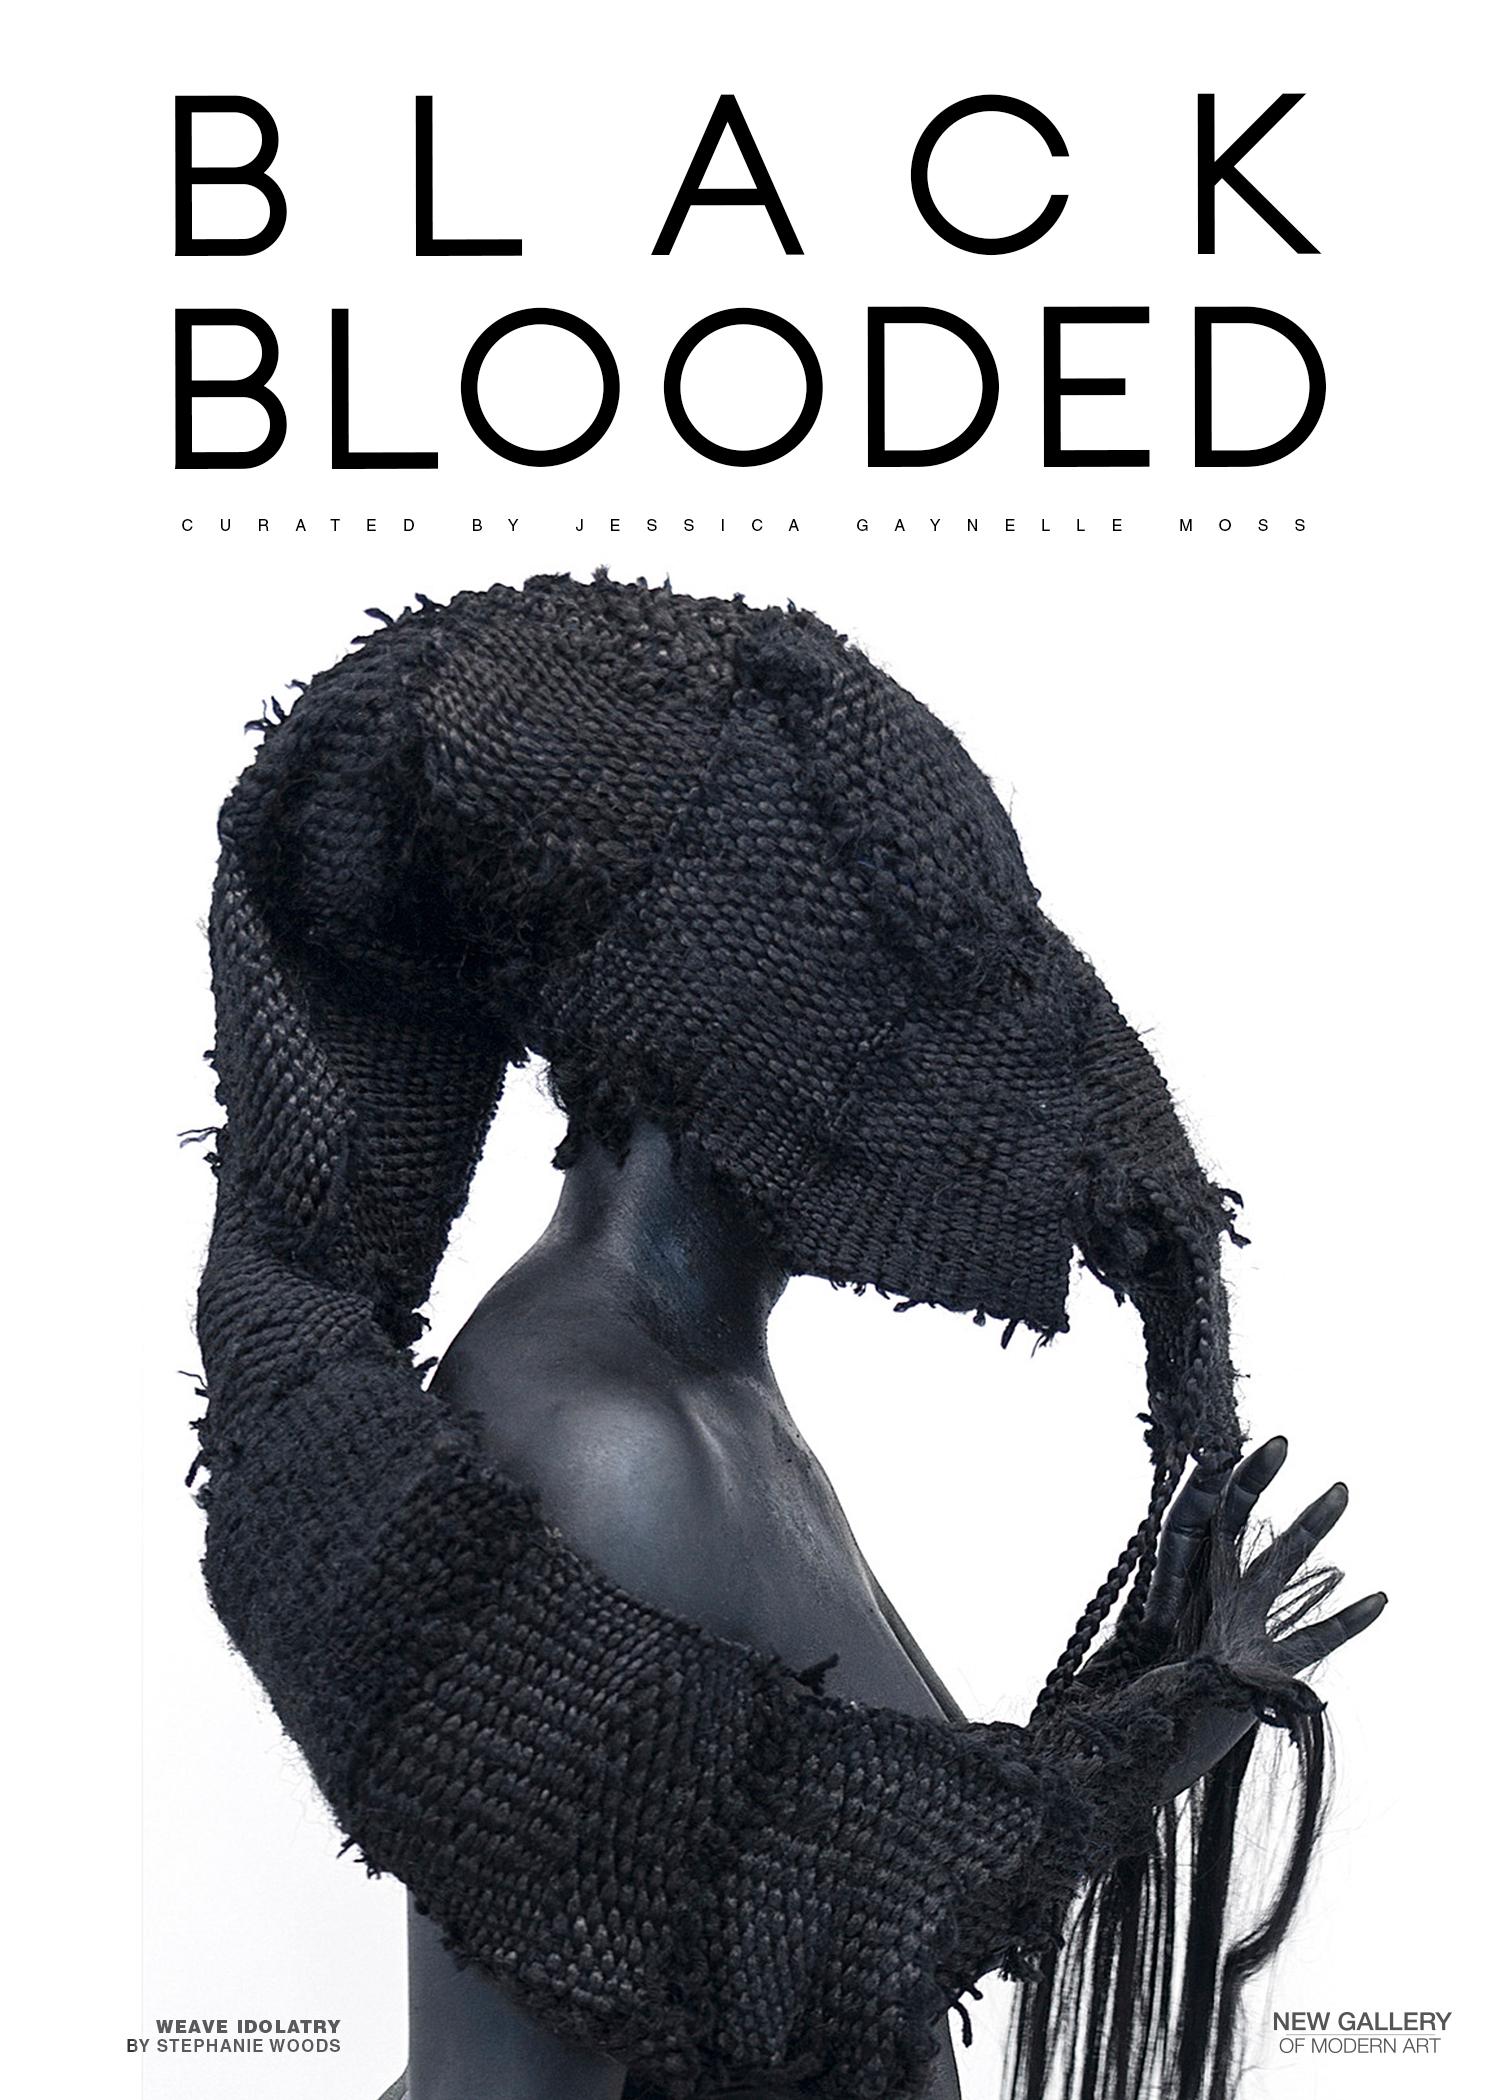 black blooded(a) portrait FRONT.jpg